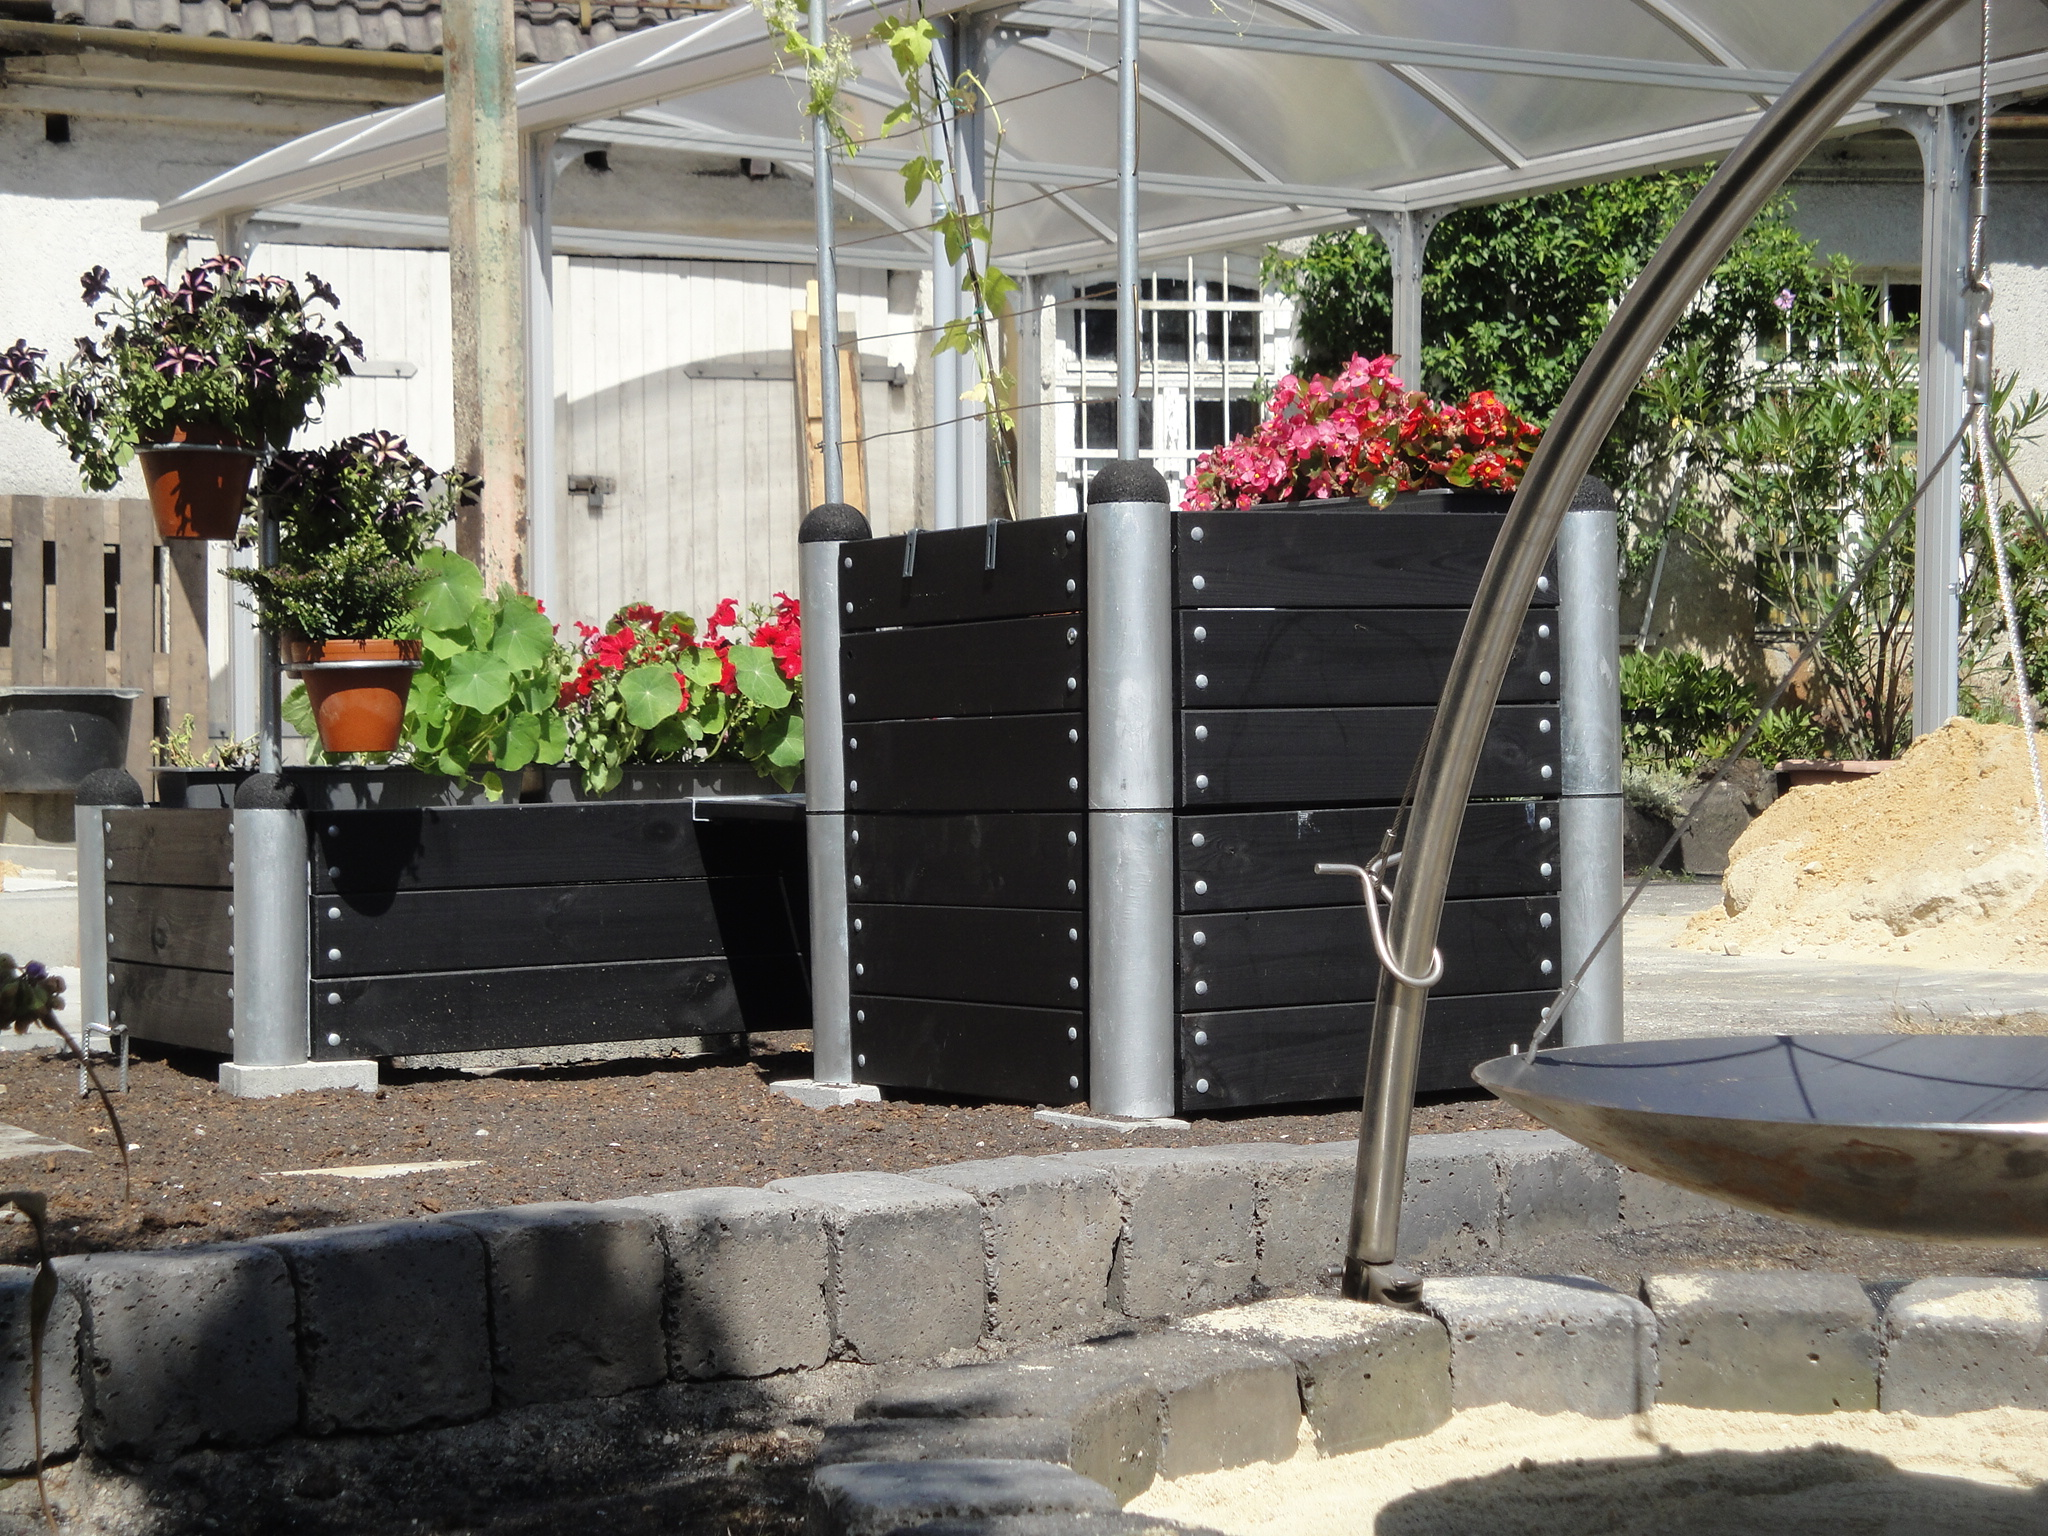 gartentraeume pergola system sitzecke gartenmoebel. Black Bedroom Furniture Sets. Home Design Ideas